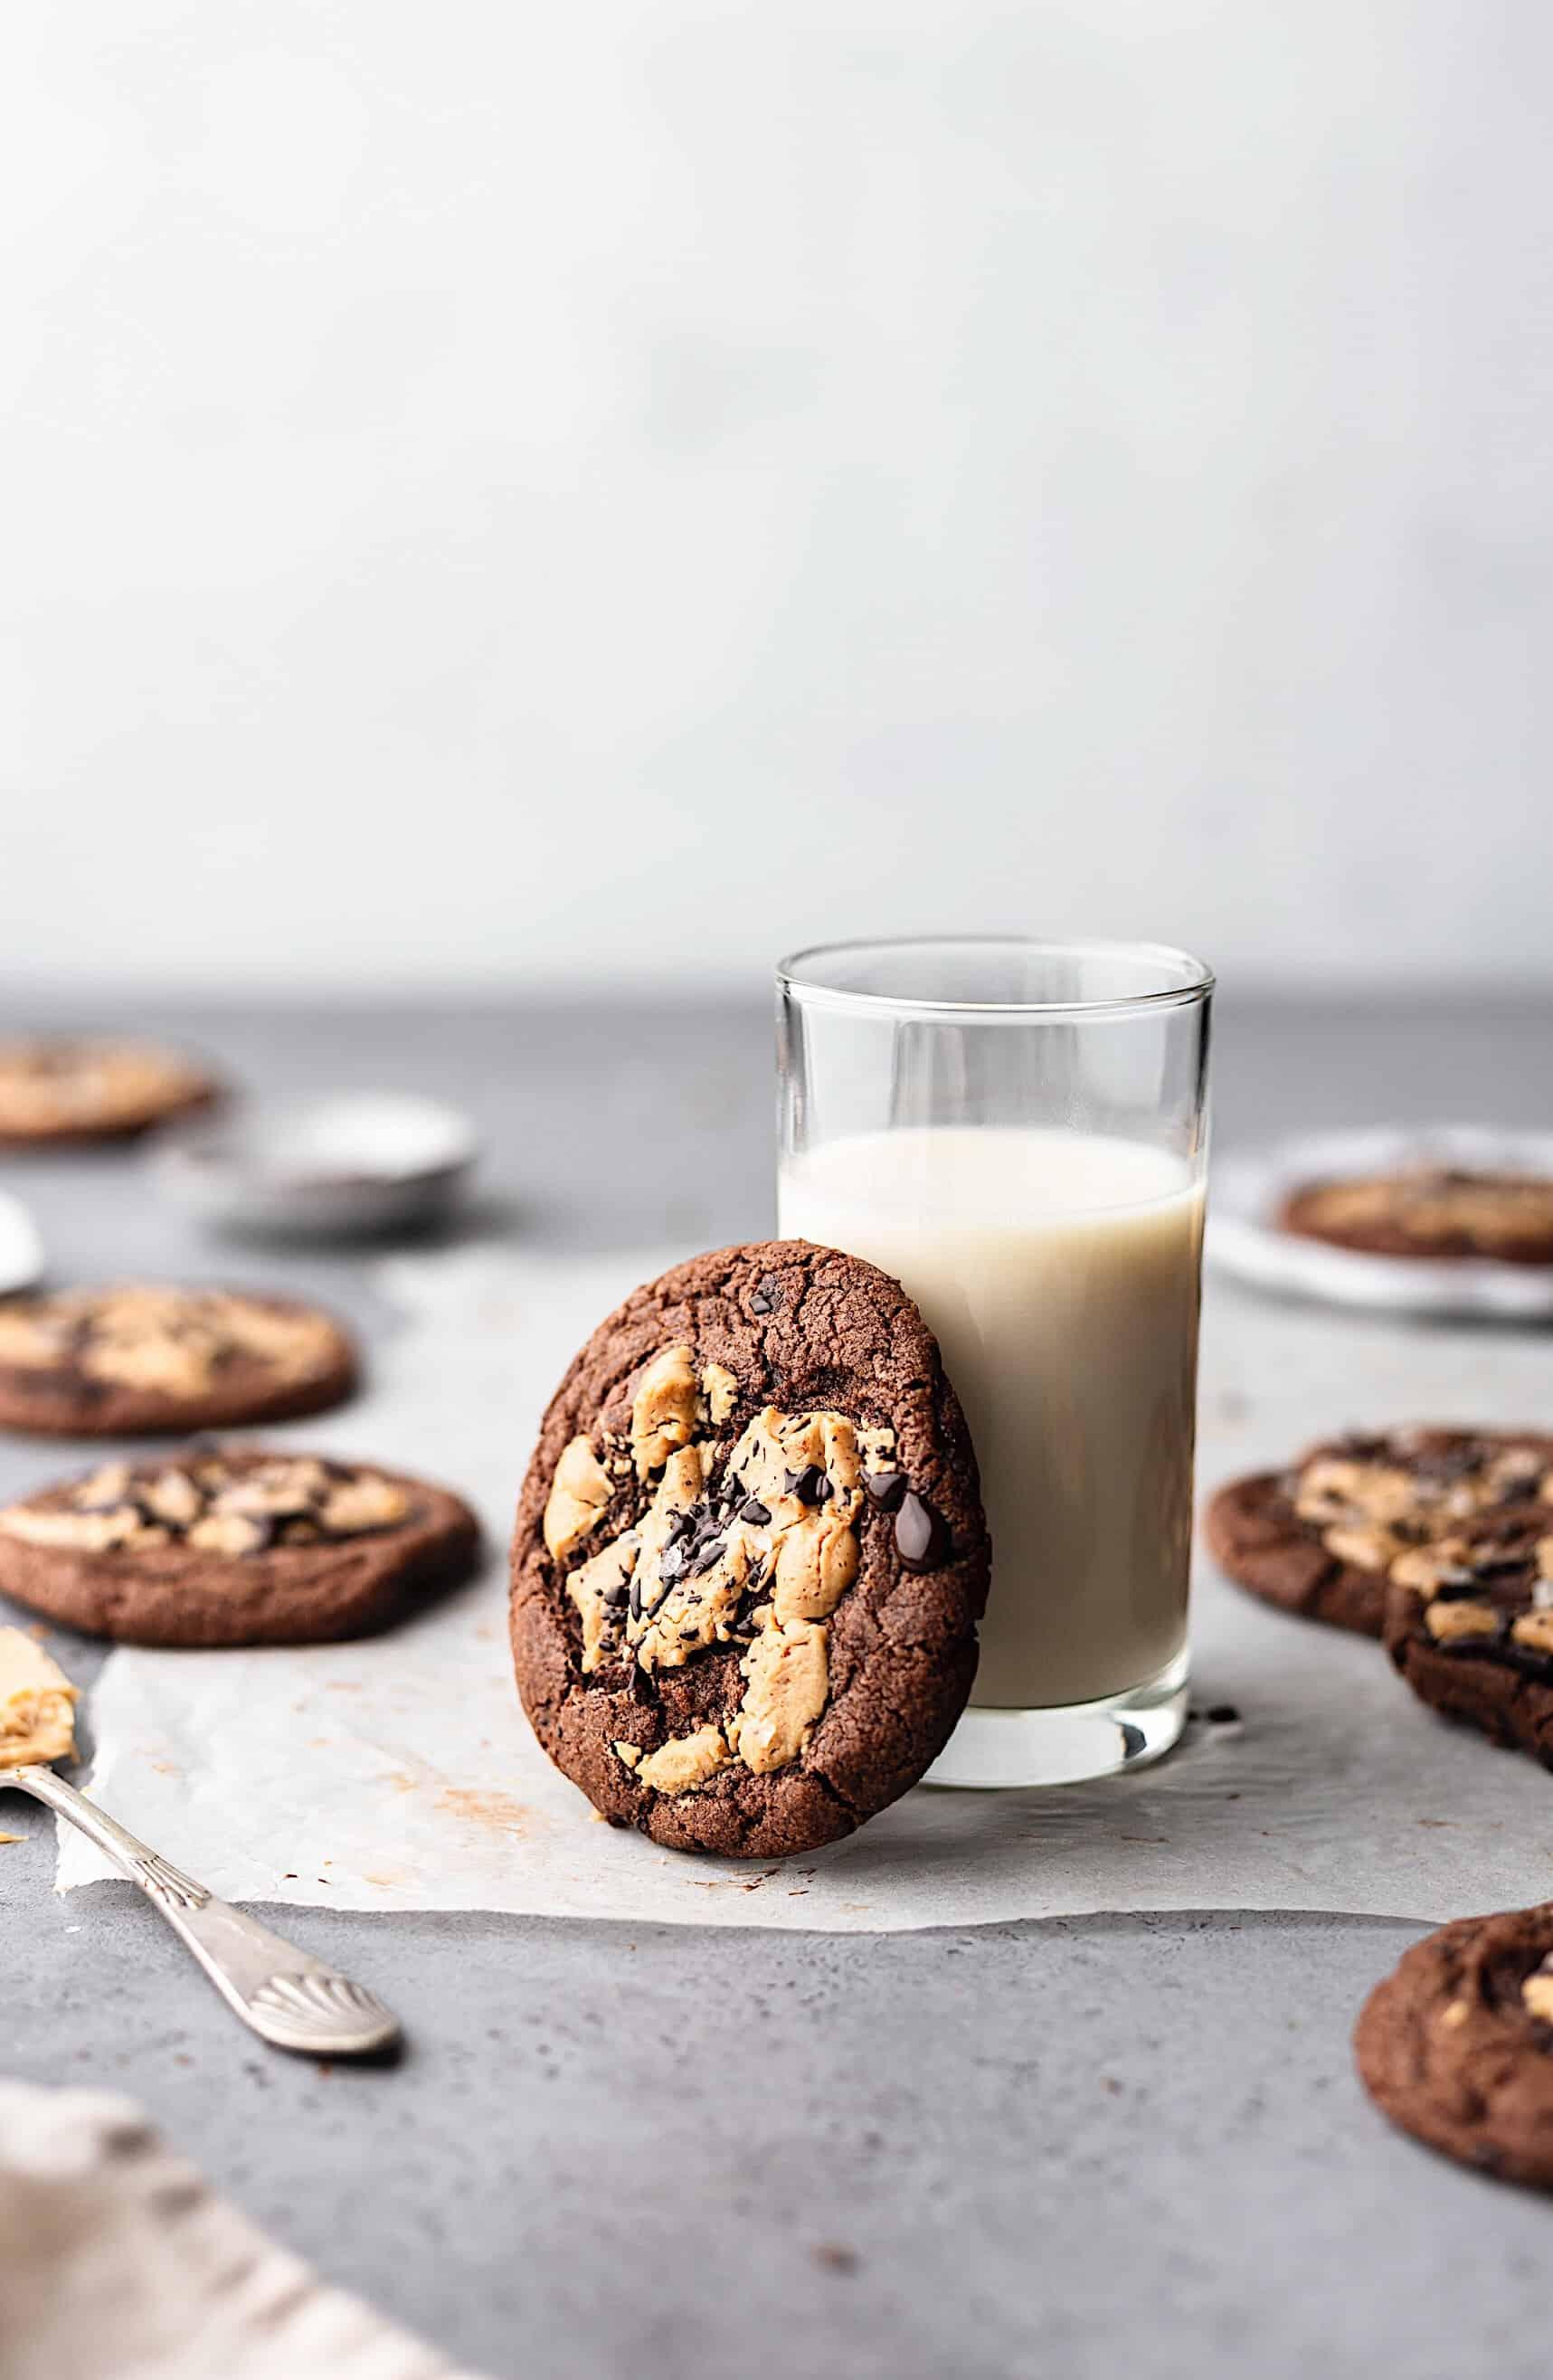 Vegan Chocolate Peanut Butter Cookies #cookies #recipe #vegan #chocolate #peanutbutter